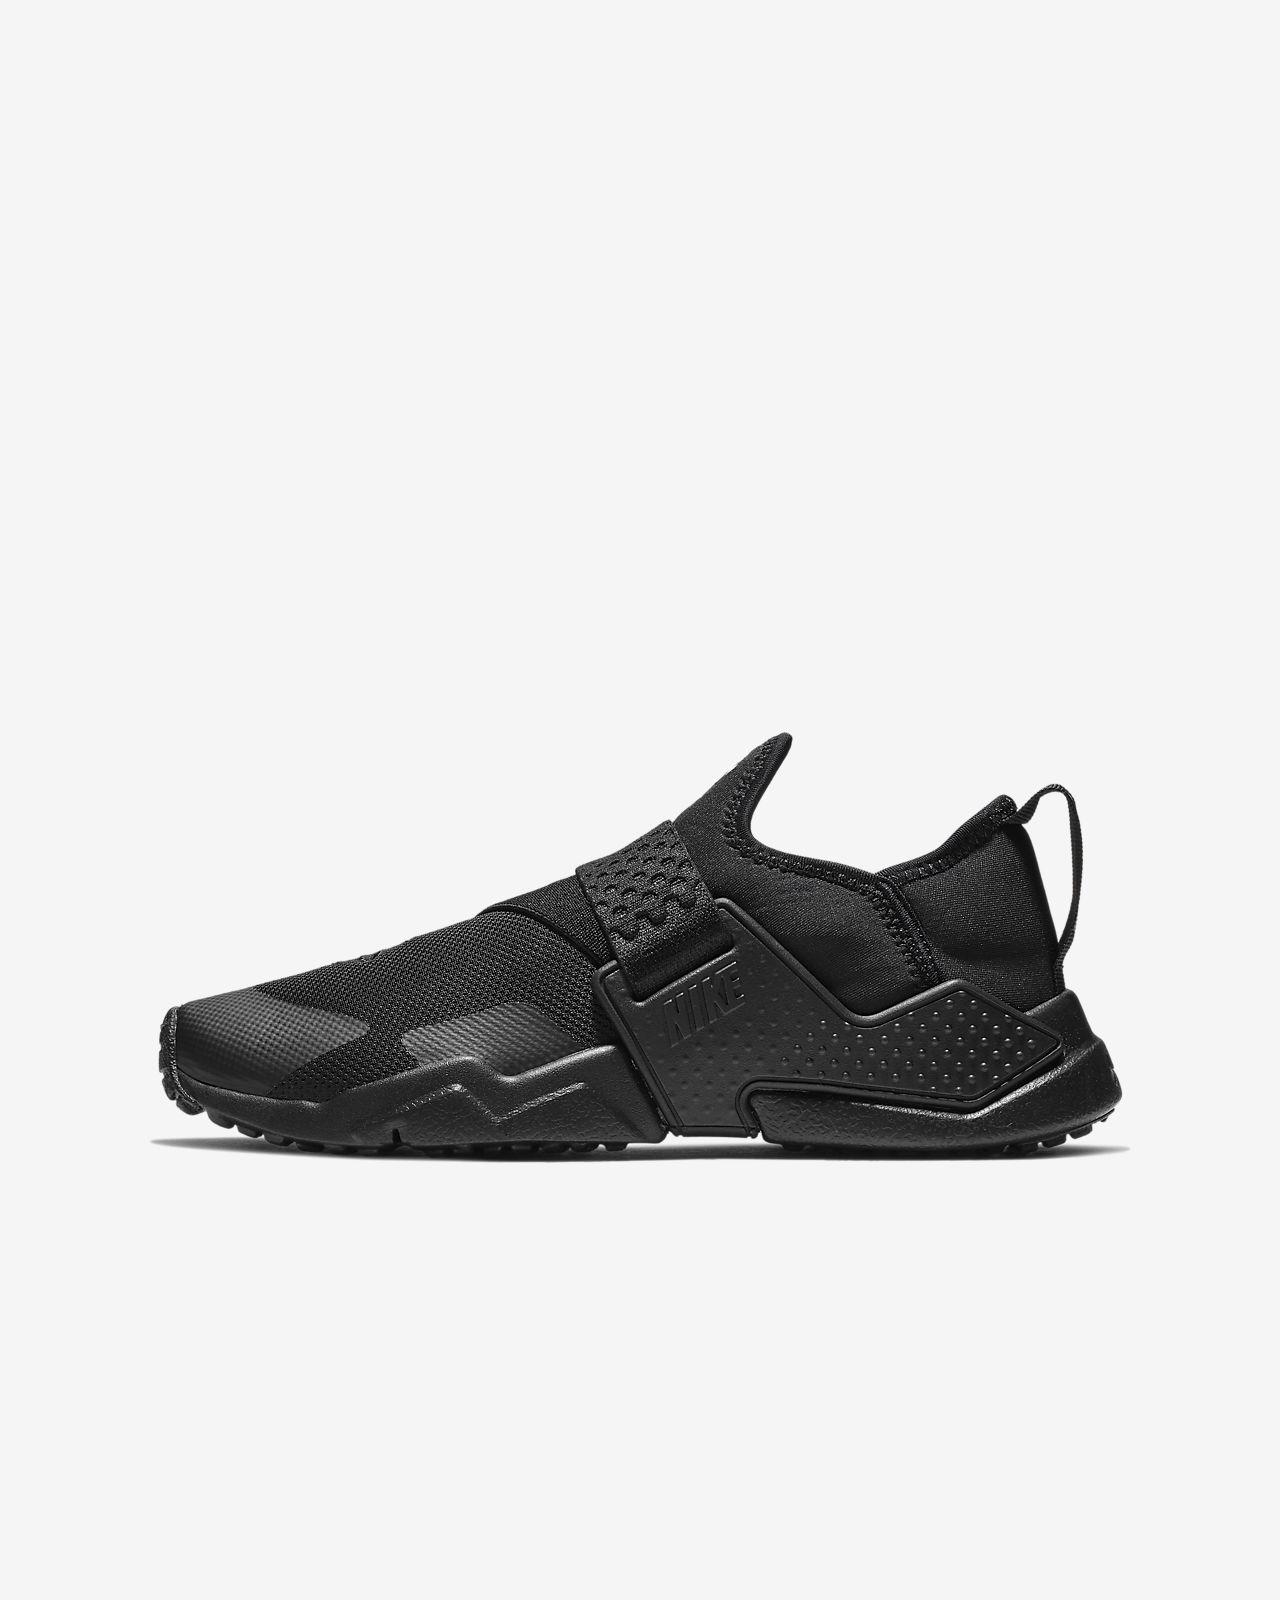 e9a1b339cbdd Nike Huarache Extreme Big Kids  Shoe. Nike.com